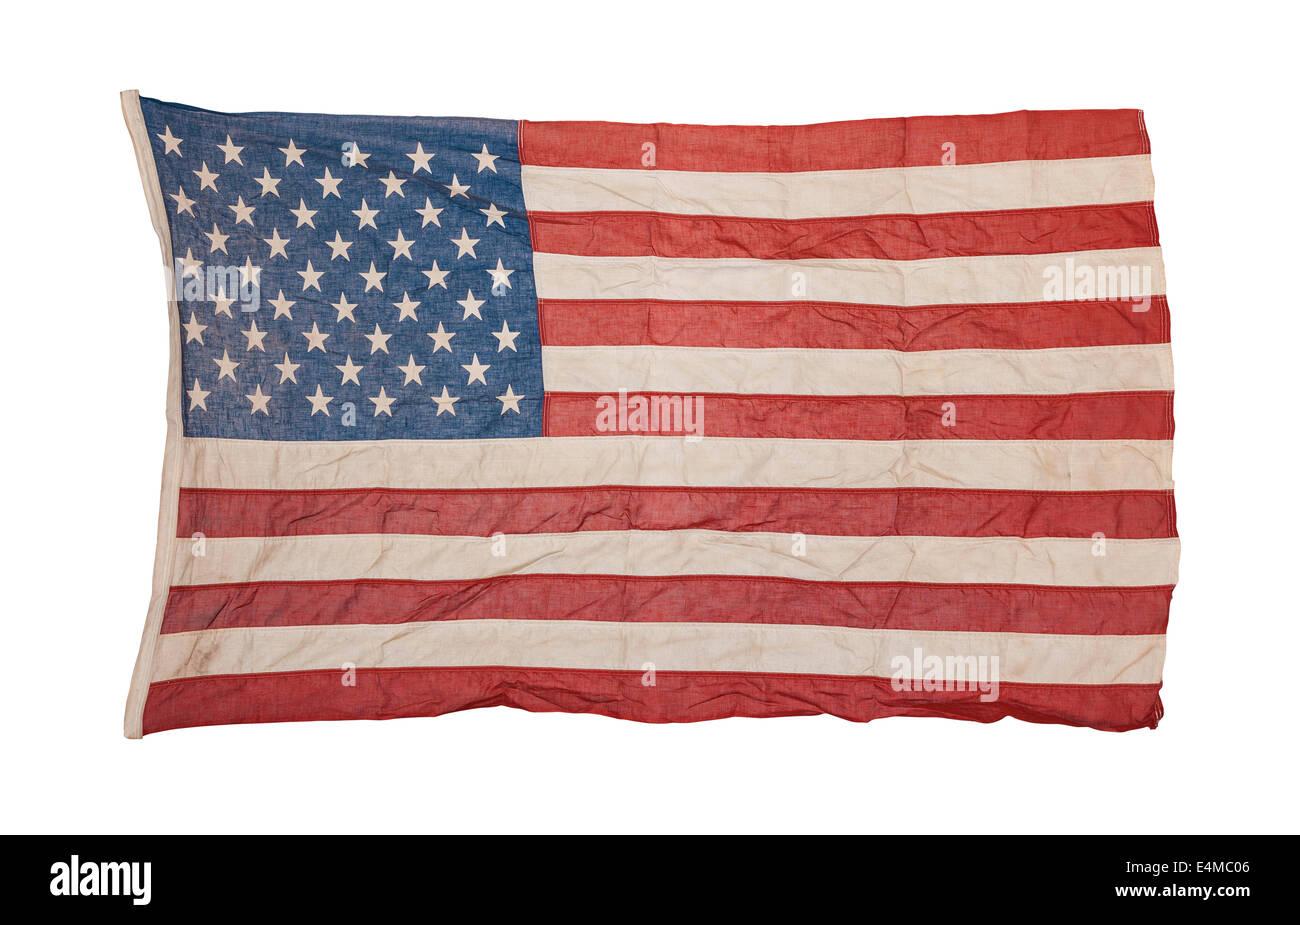 Weathered bandiera americana isolato su sfondo bianco Immagini Stock